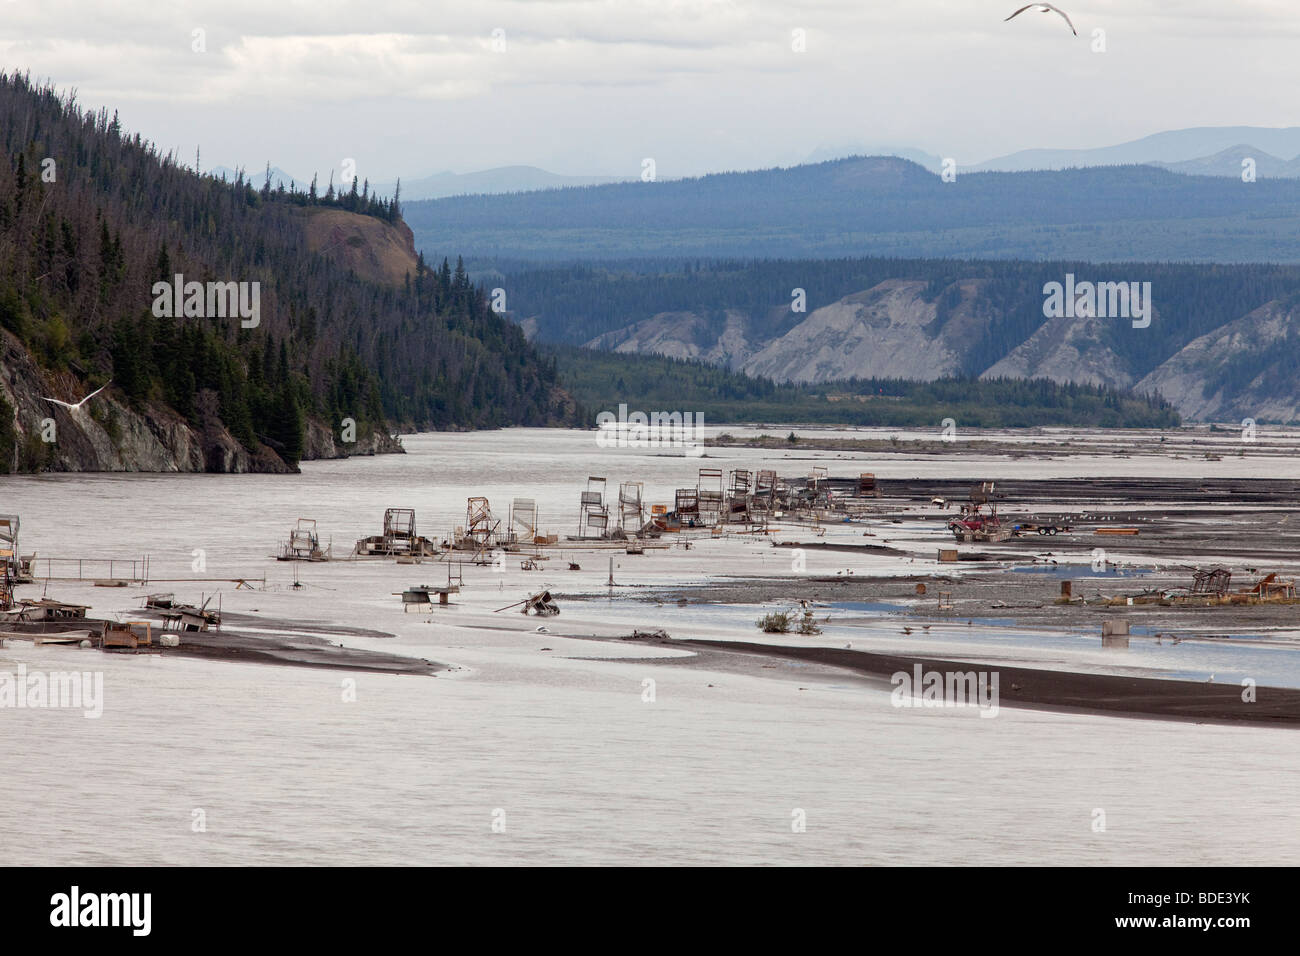 Fish Wheels on Copper River in Alaska - Stock Image